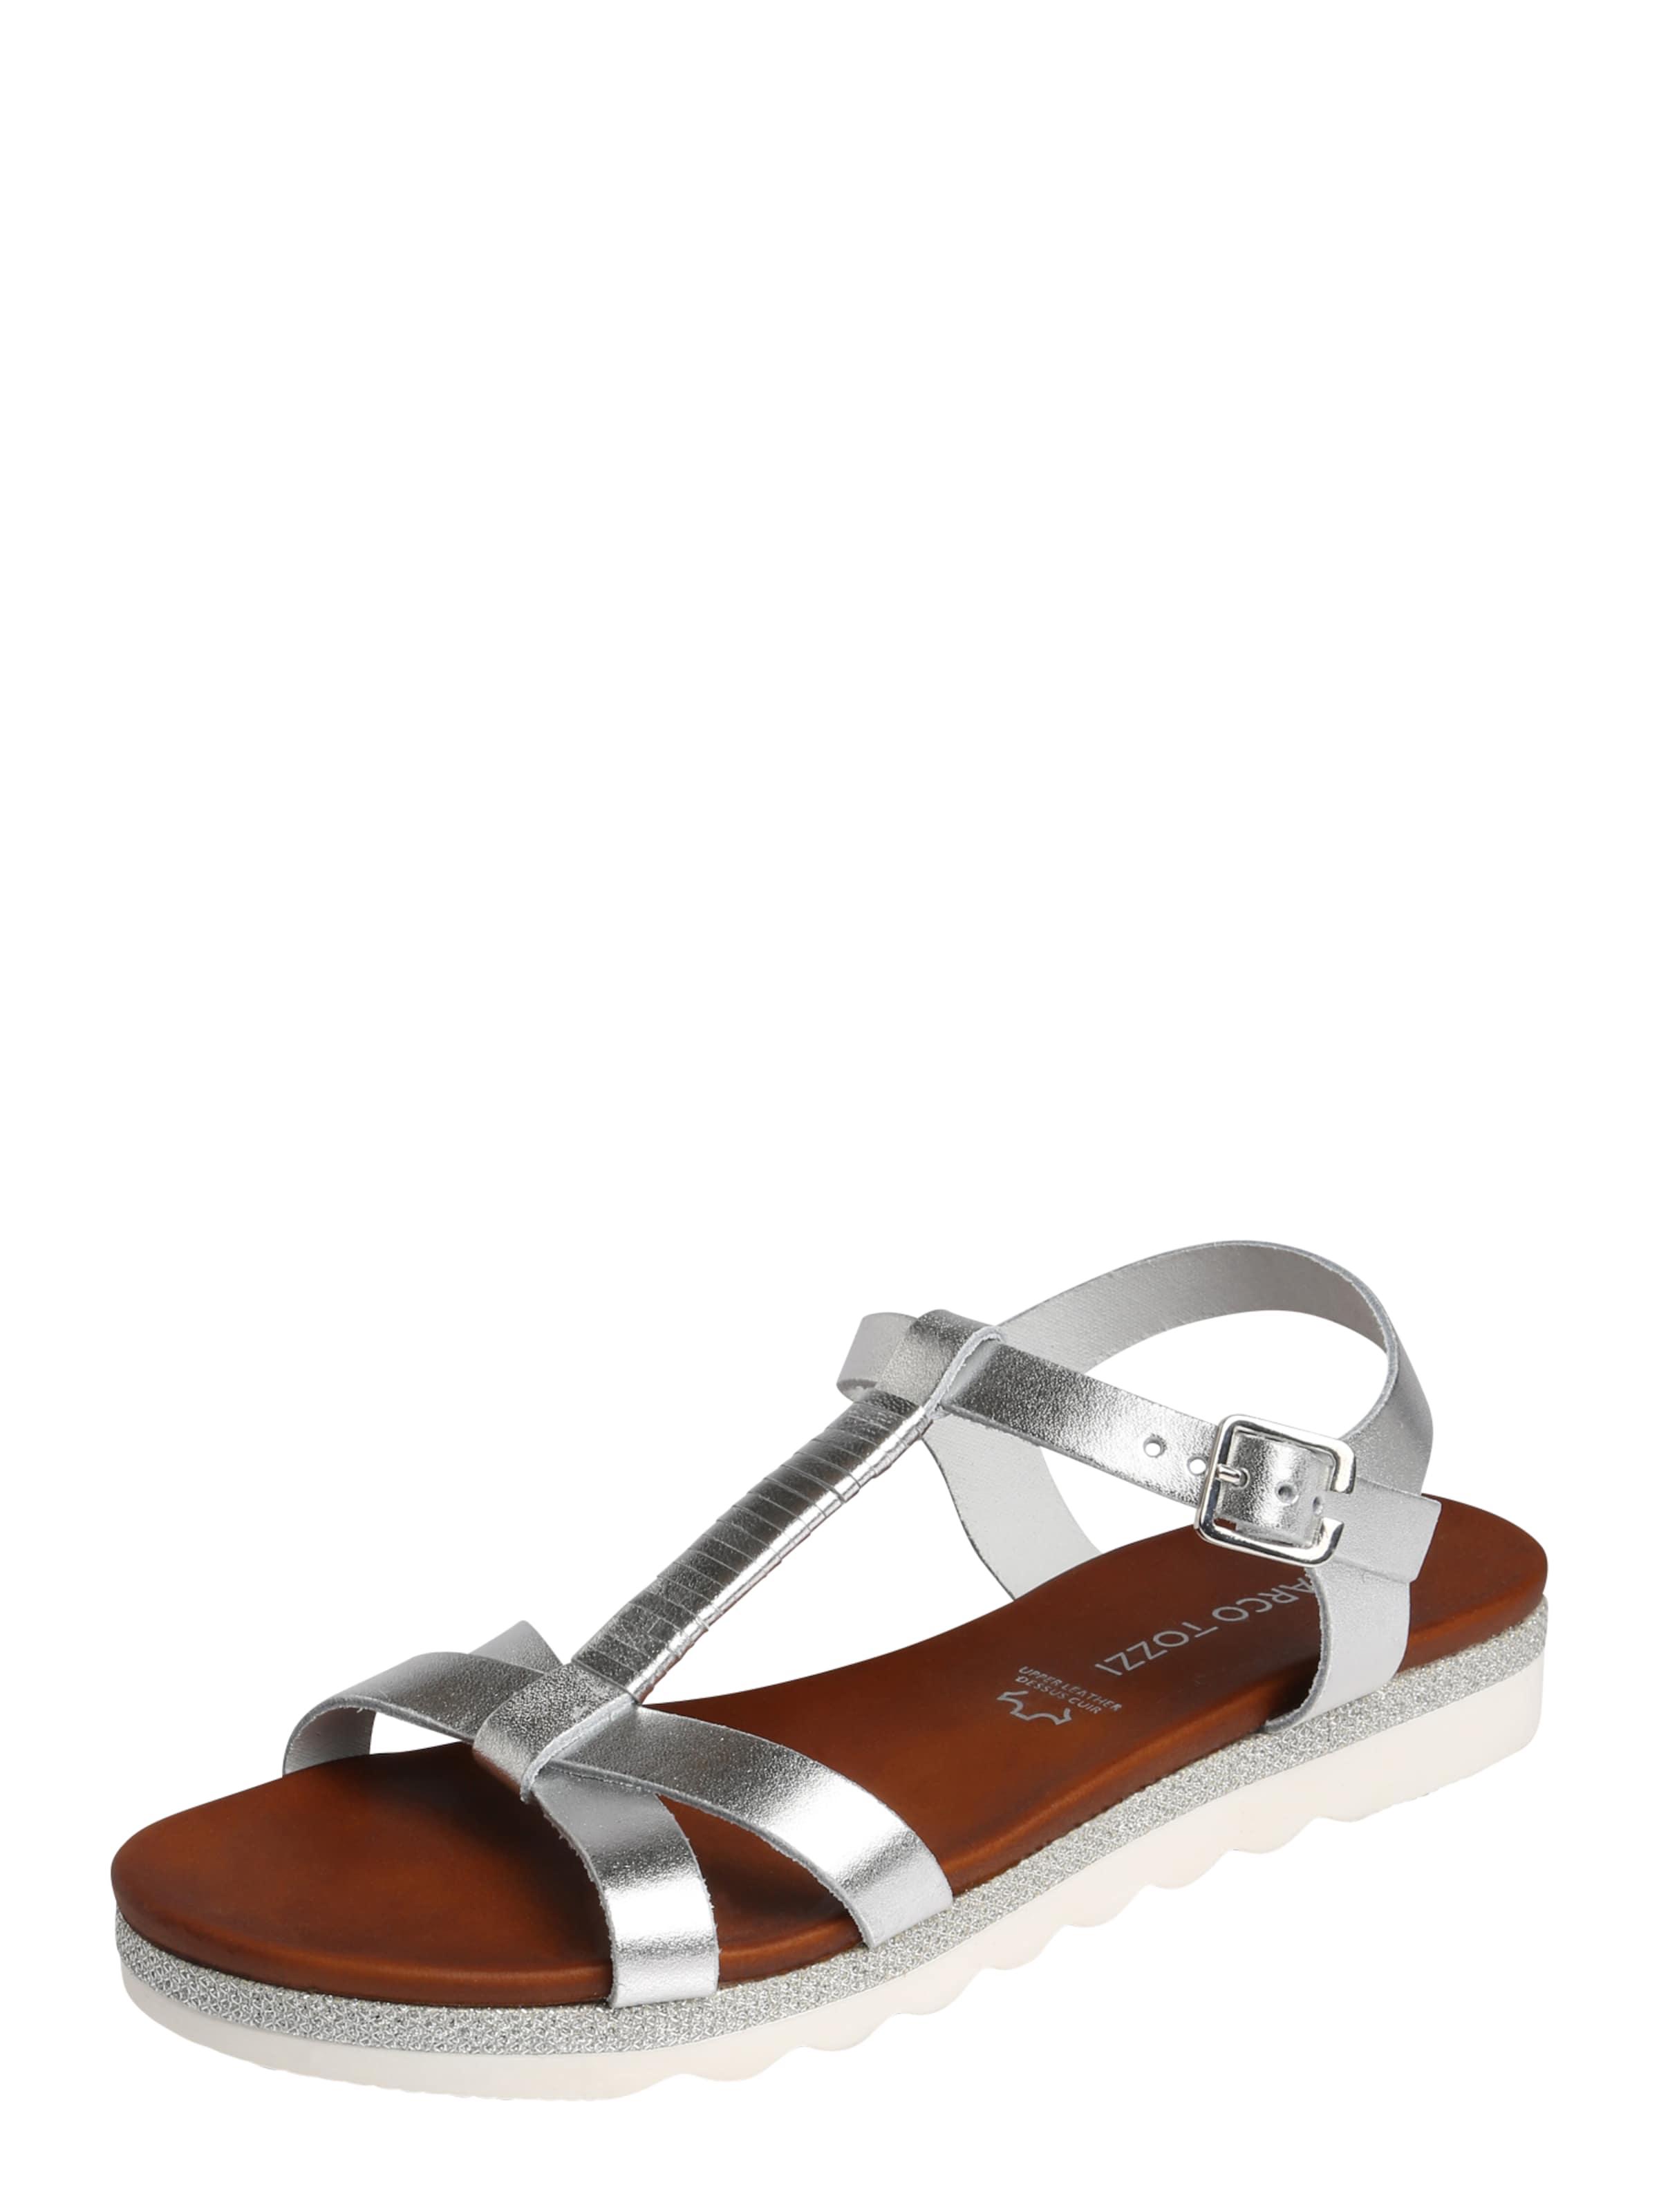 MARCO TOZZI Riemchensandale Verschleißfeste billige Schuhe